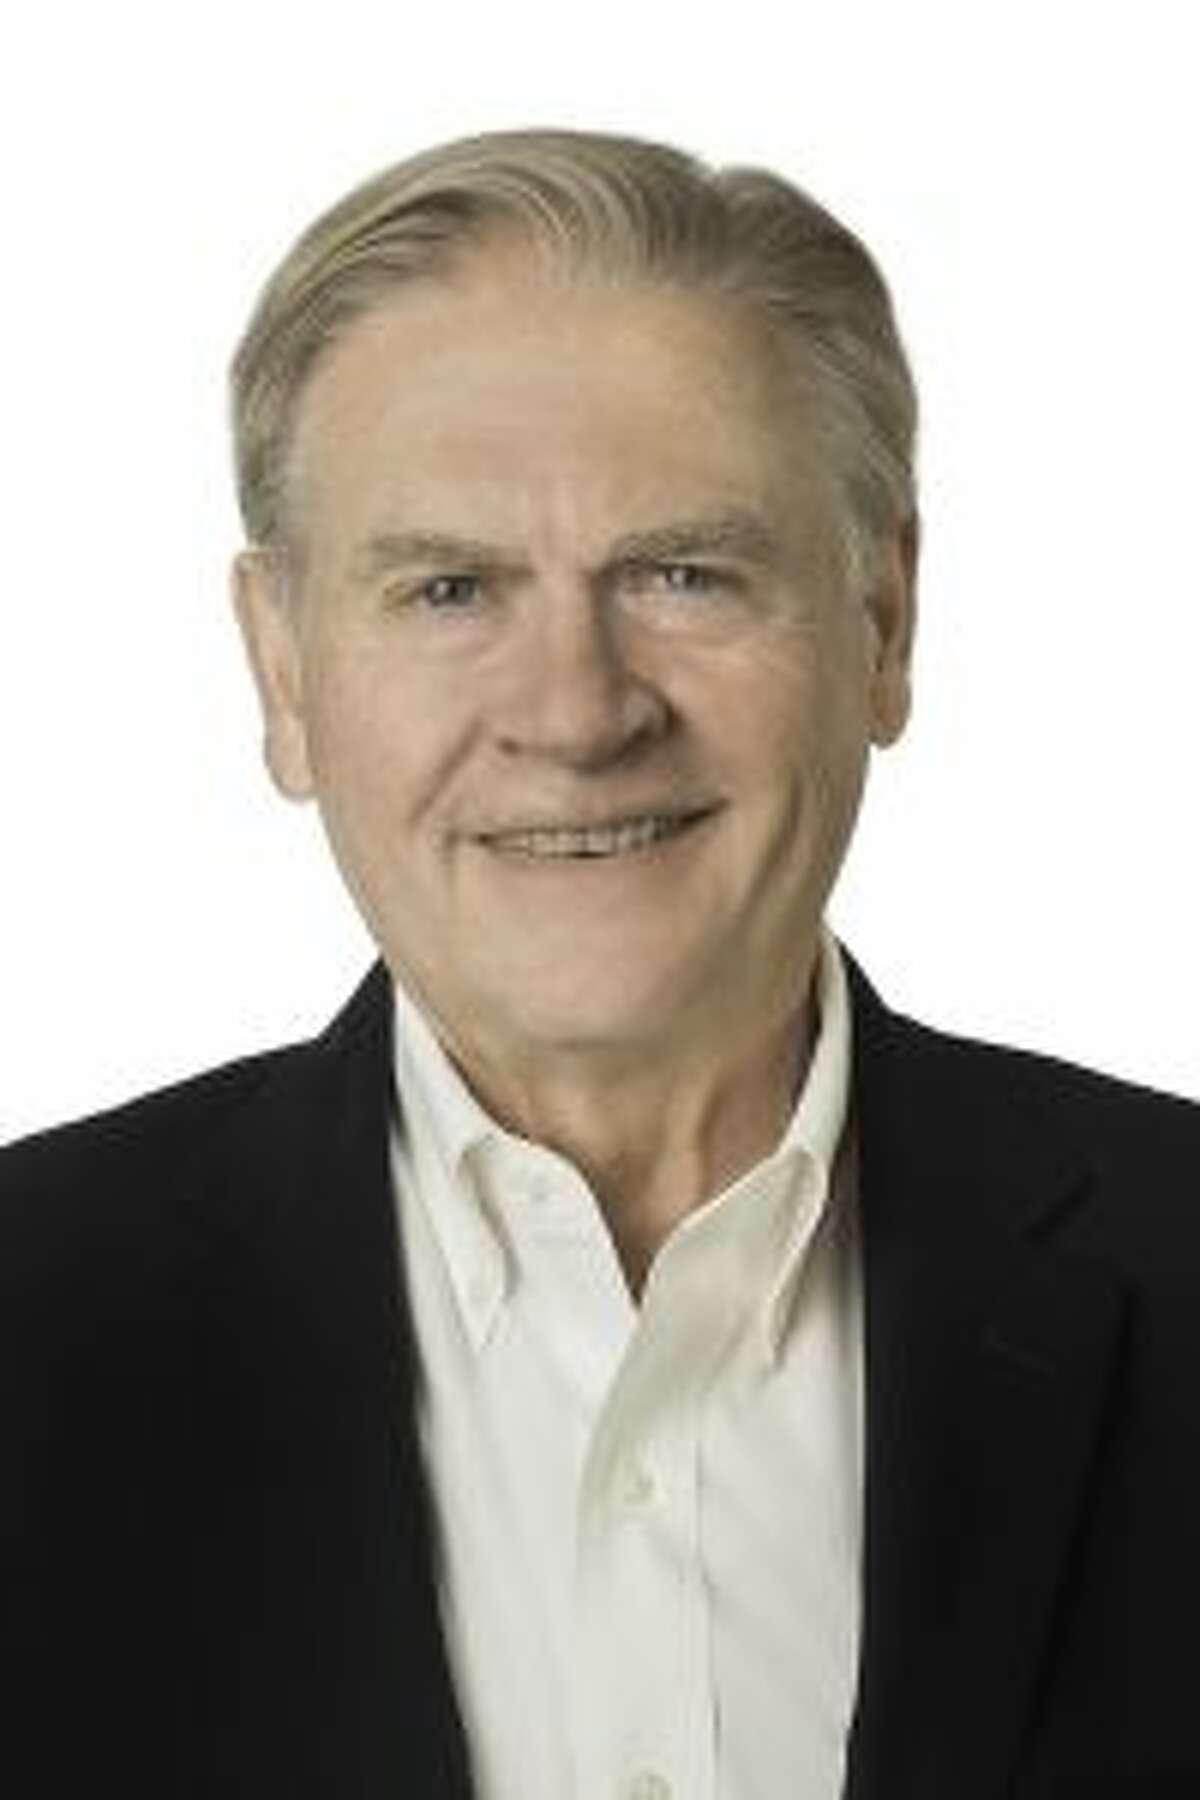 Jack Horstmeyer